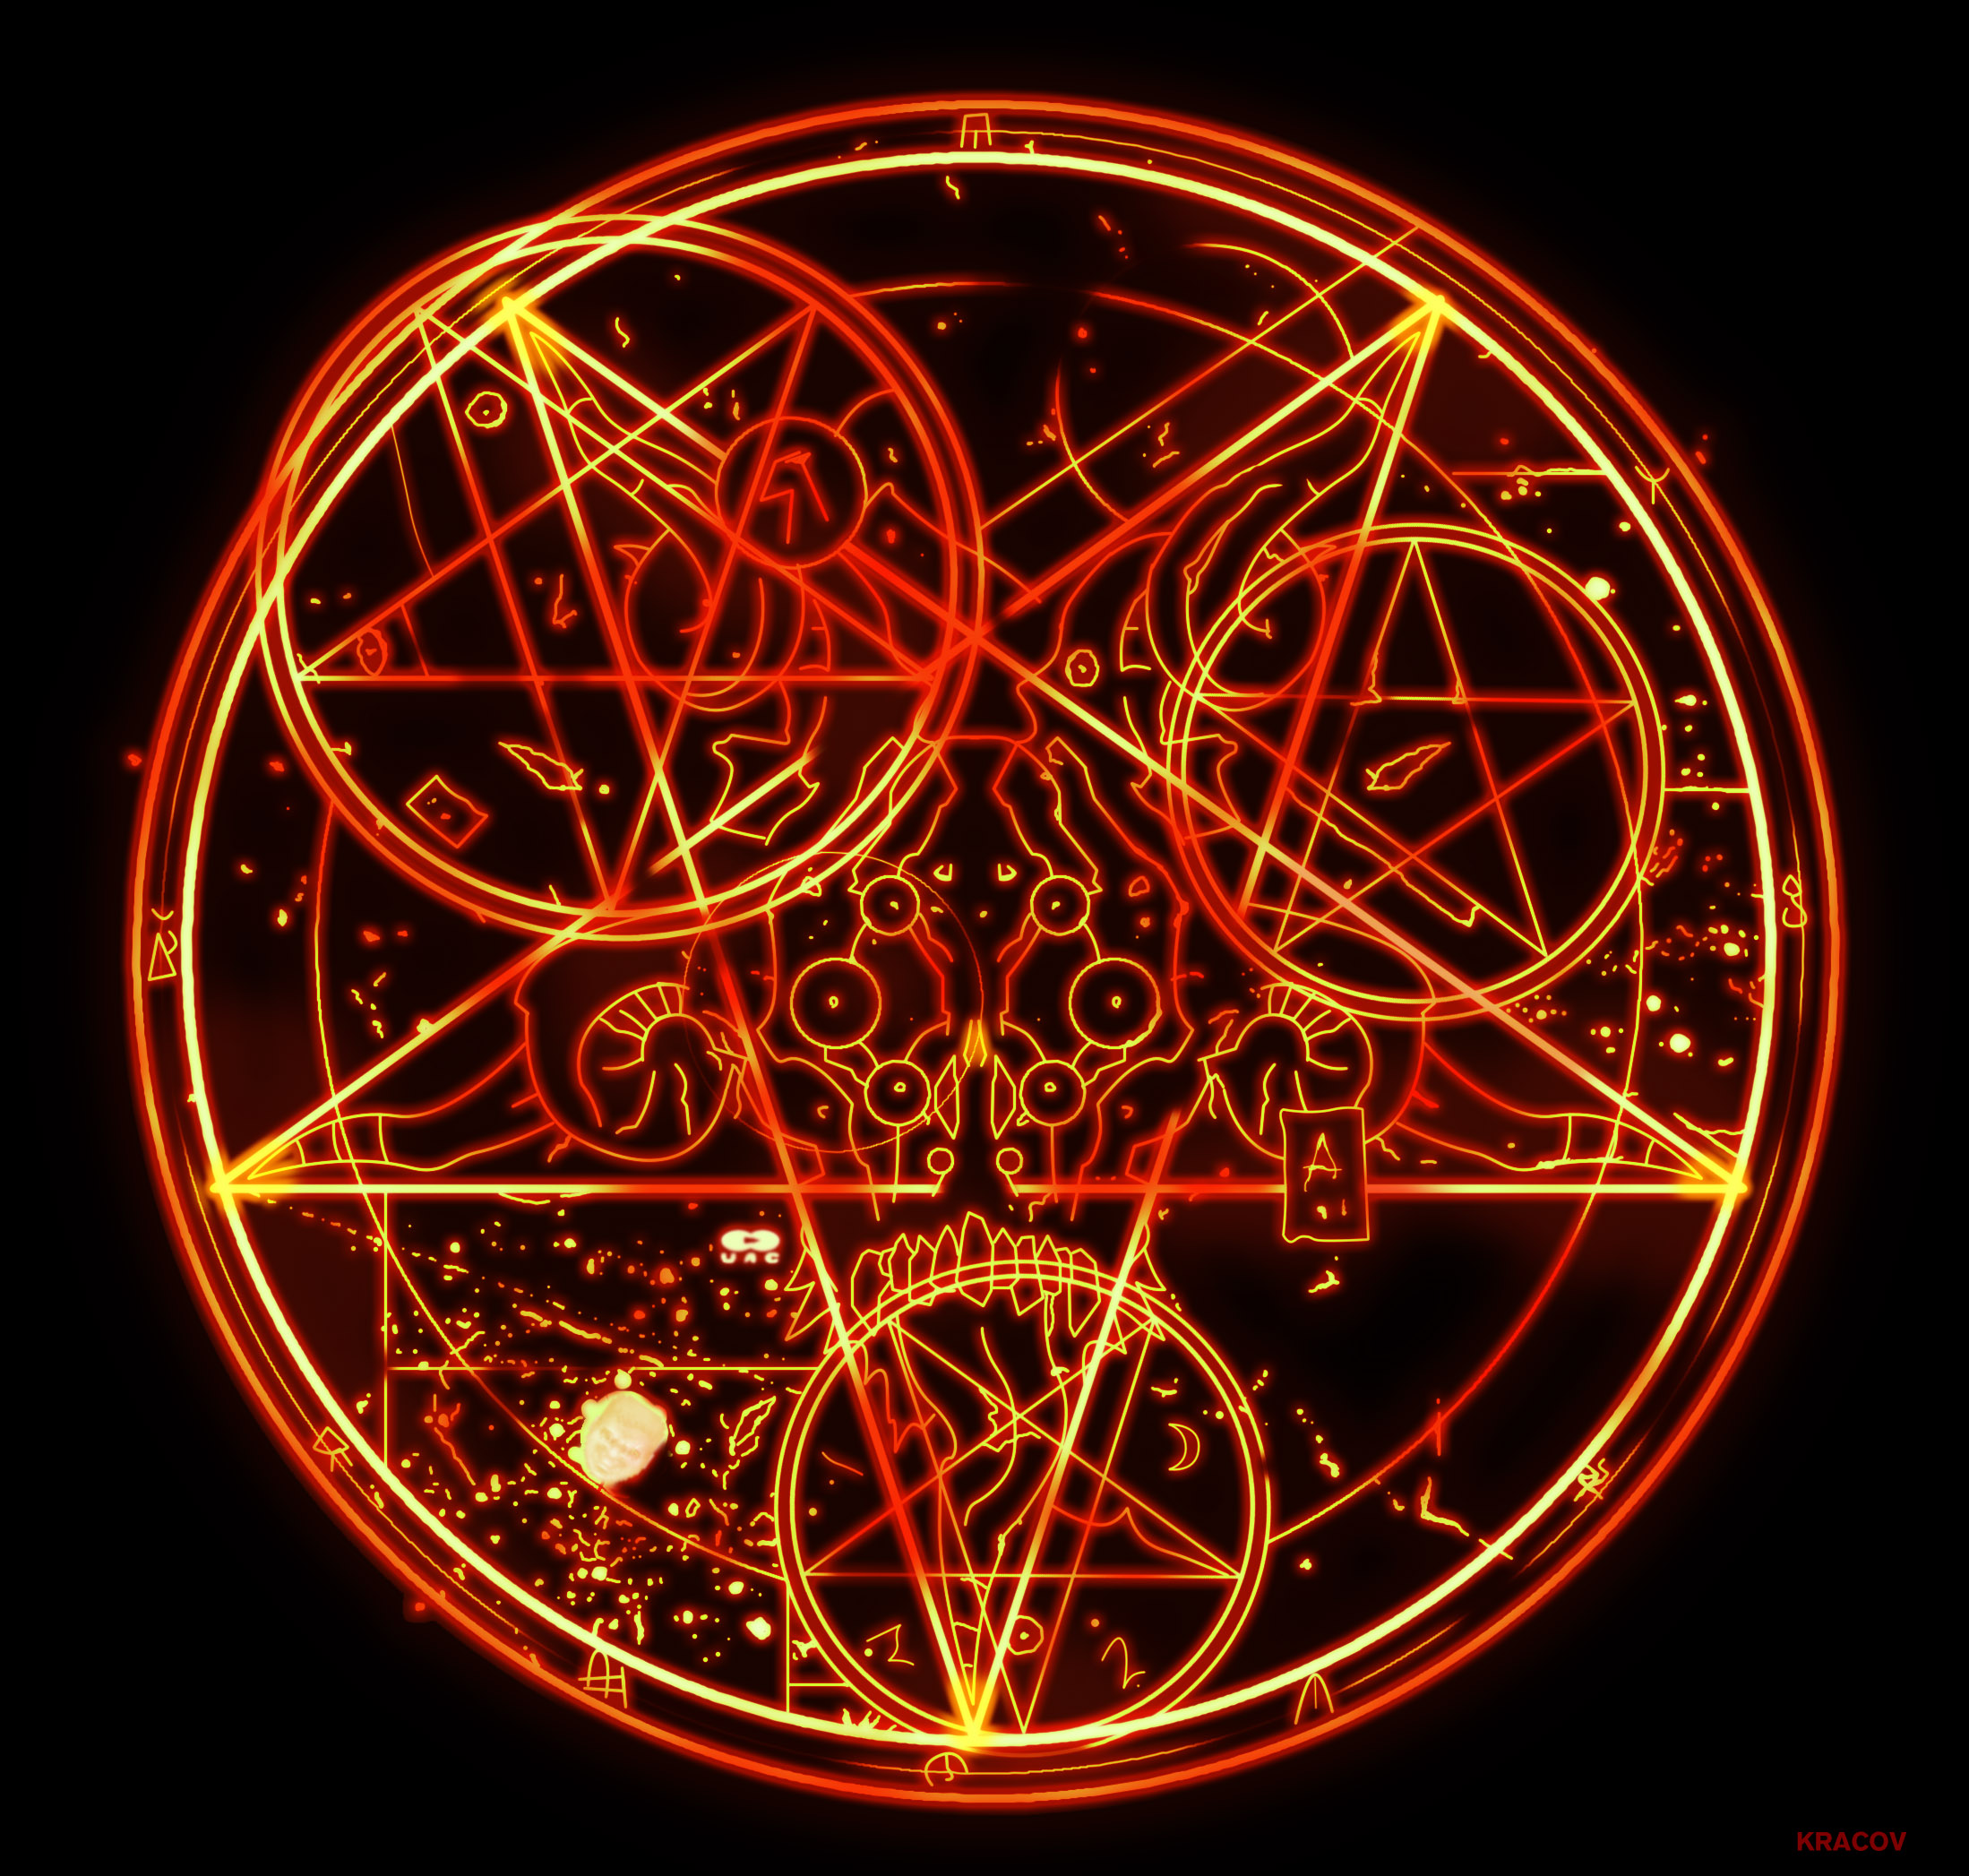 Doom 3 Pentagram Hd By Kracov On Deviantart